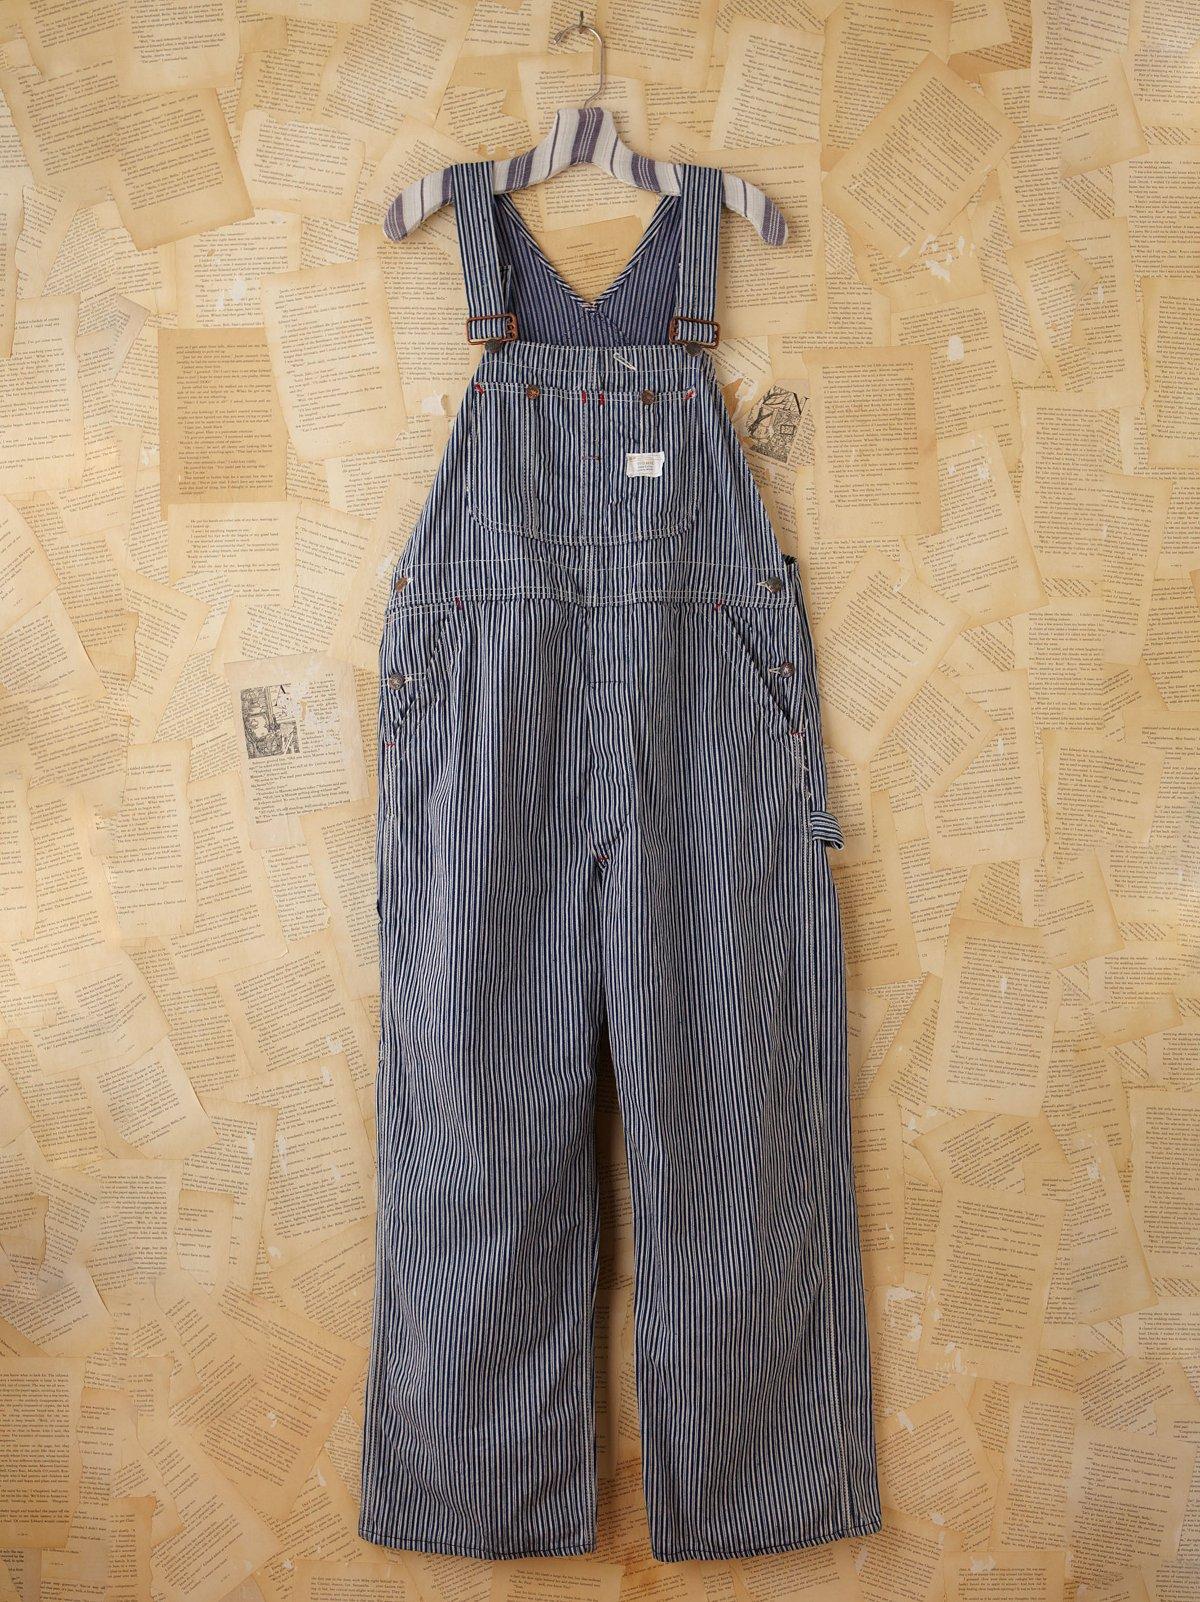 Vintage Pinstripe Overalls